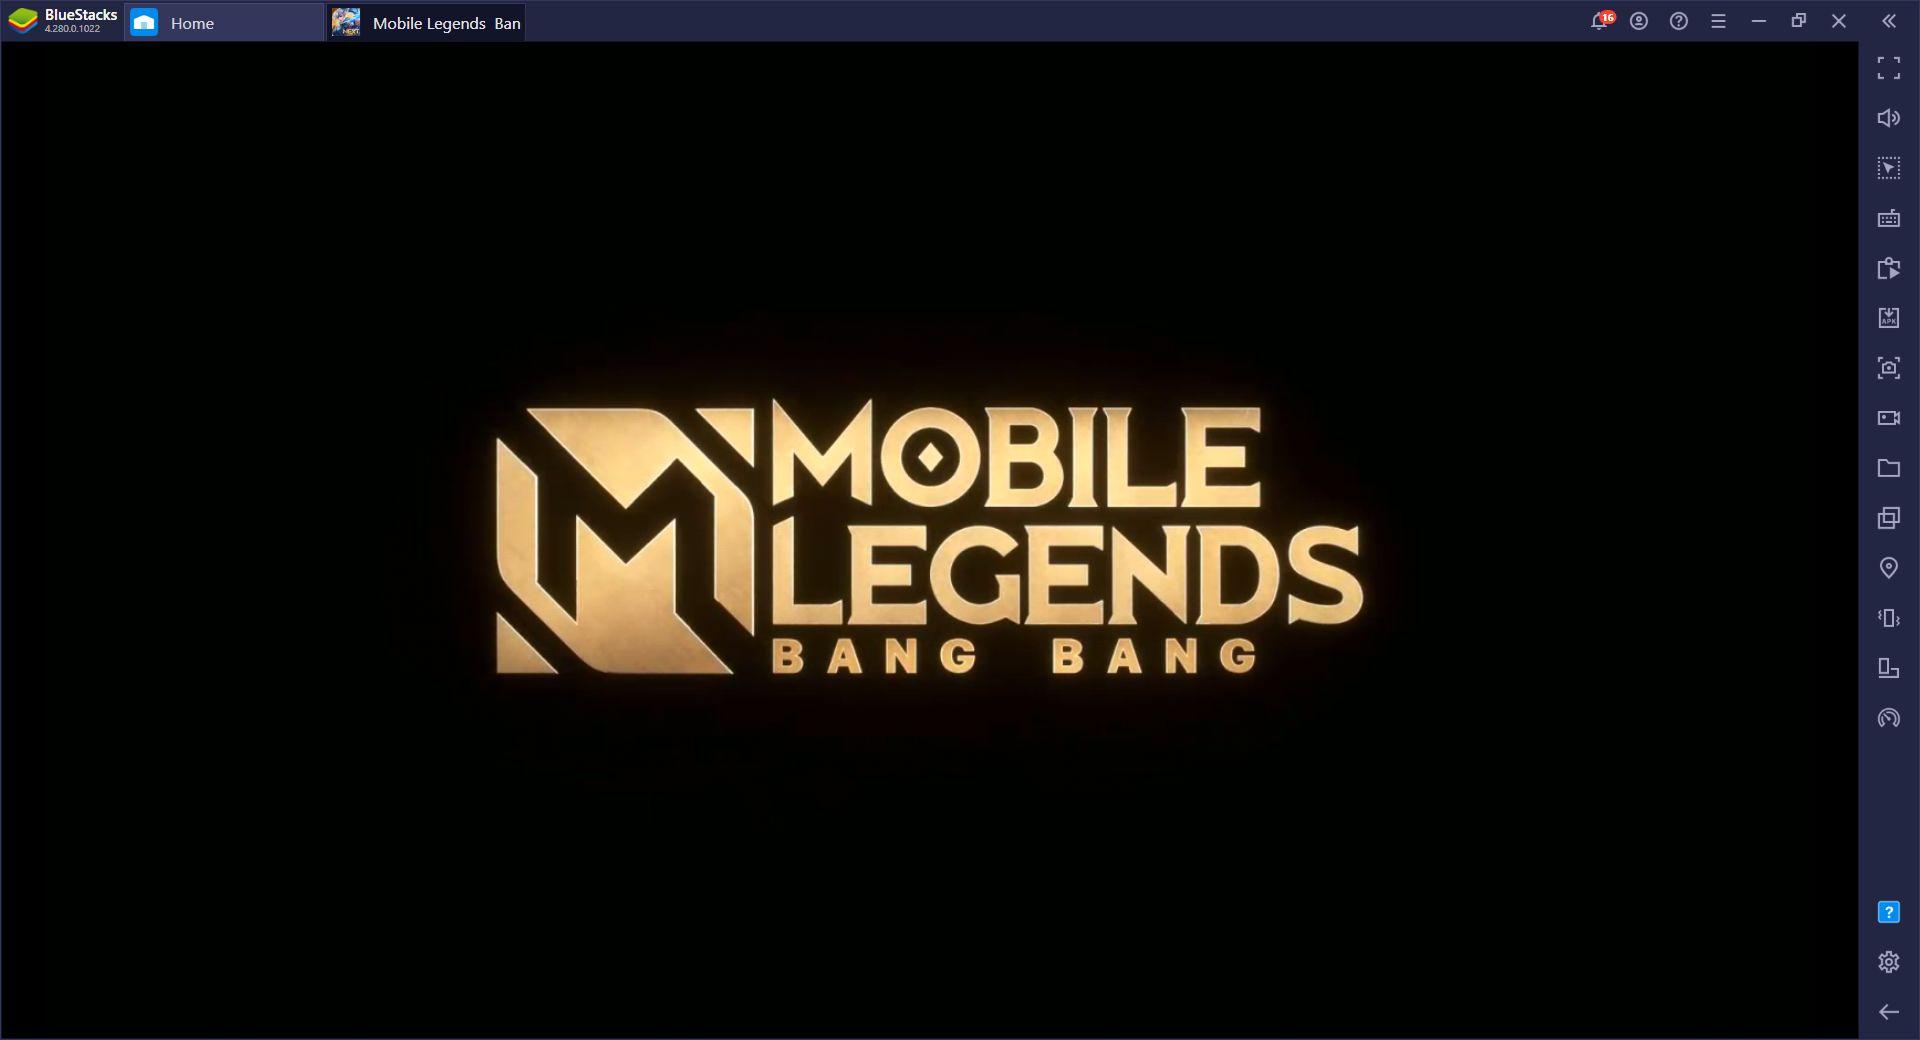 BlueStacks ile Mobile Legends: Bang Bang Oynama Rehberi